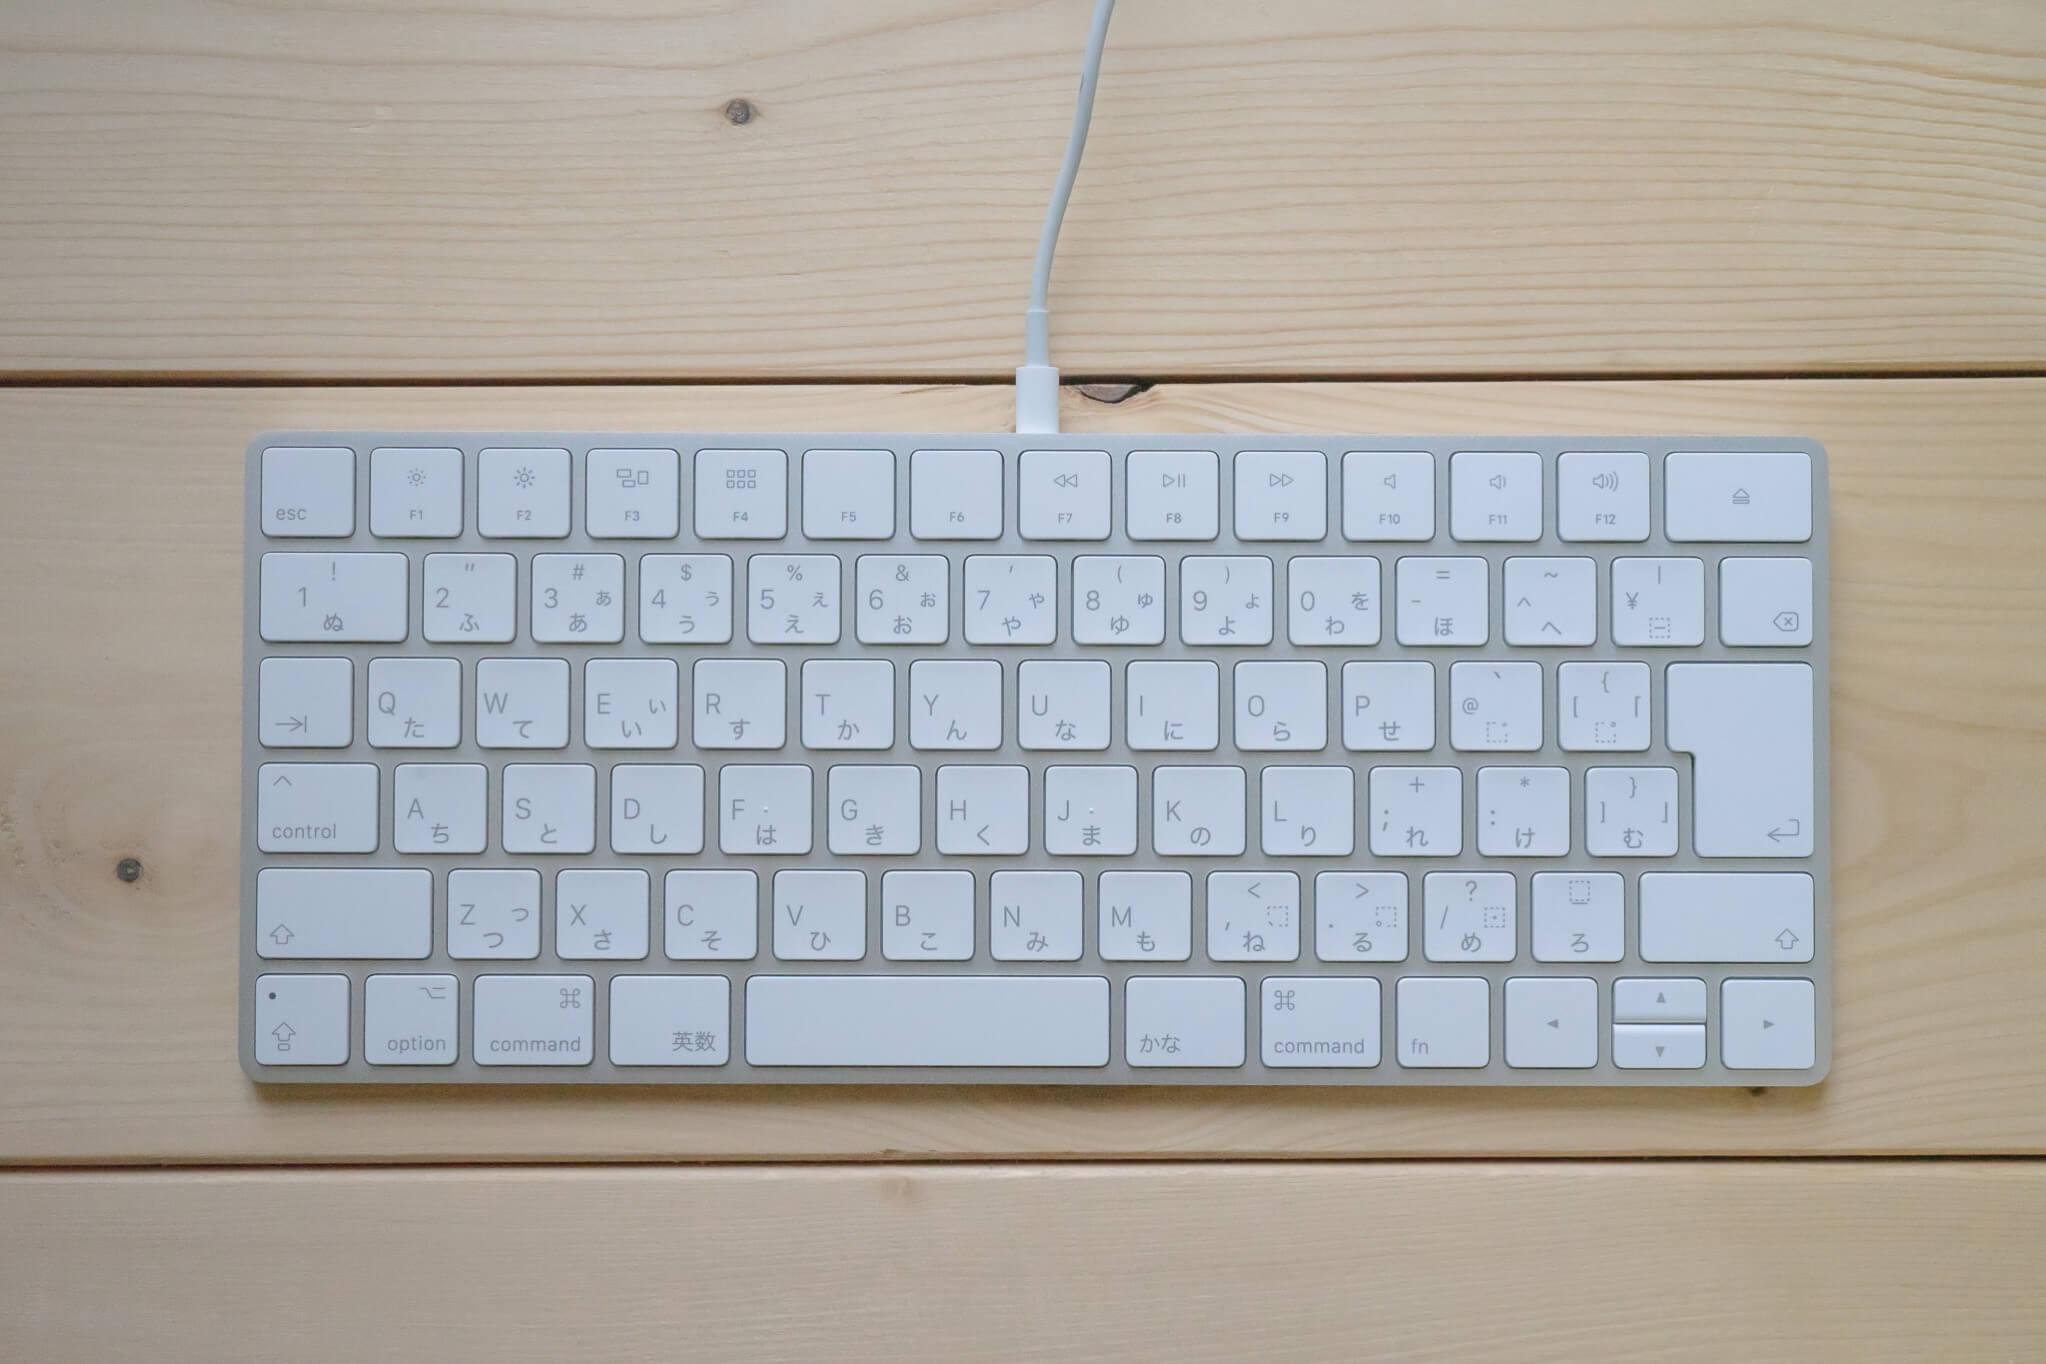 180816 magic keyboard 11